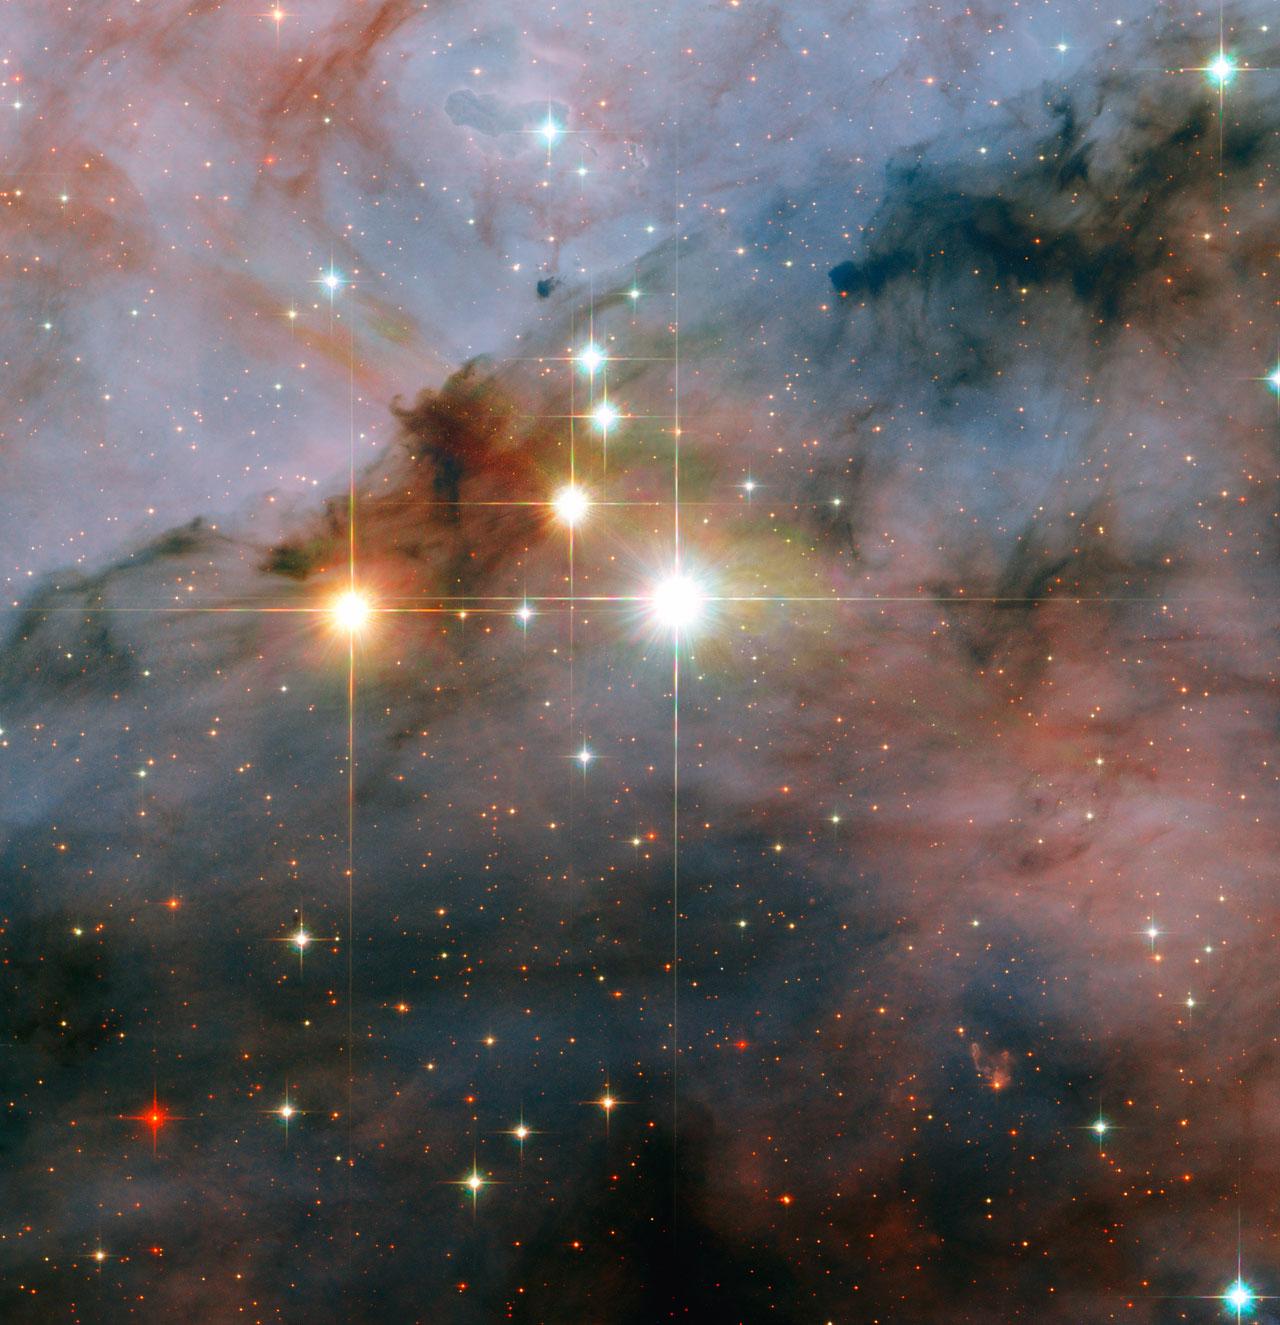 Mammoth stars seen by Hubble   ESA/Hubble